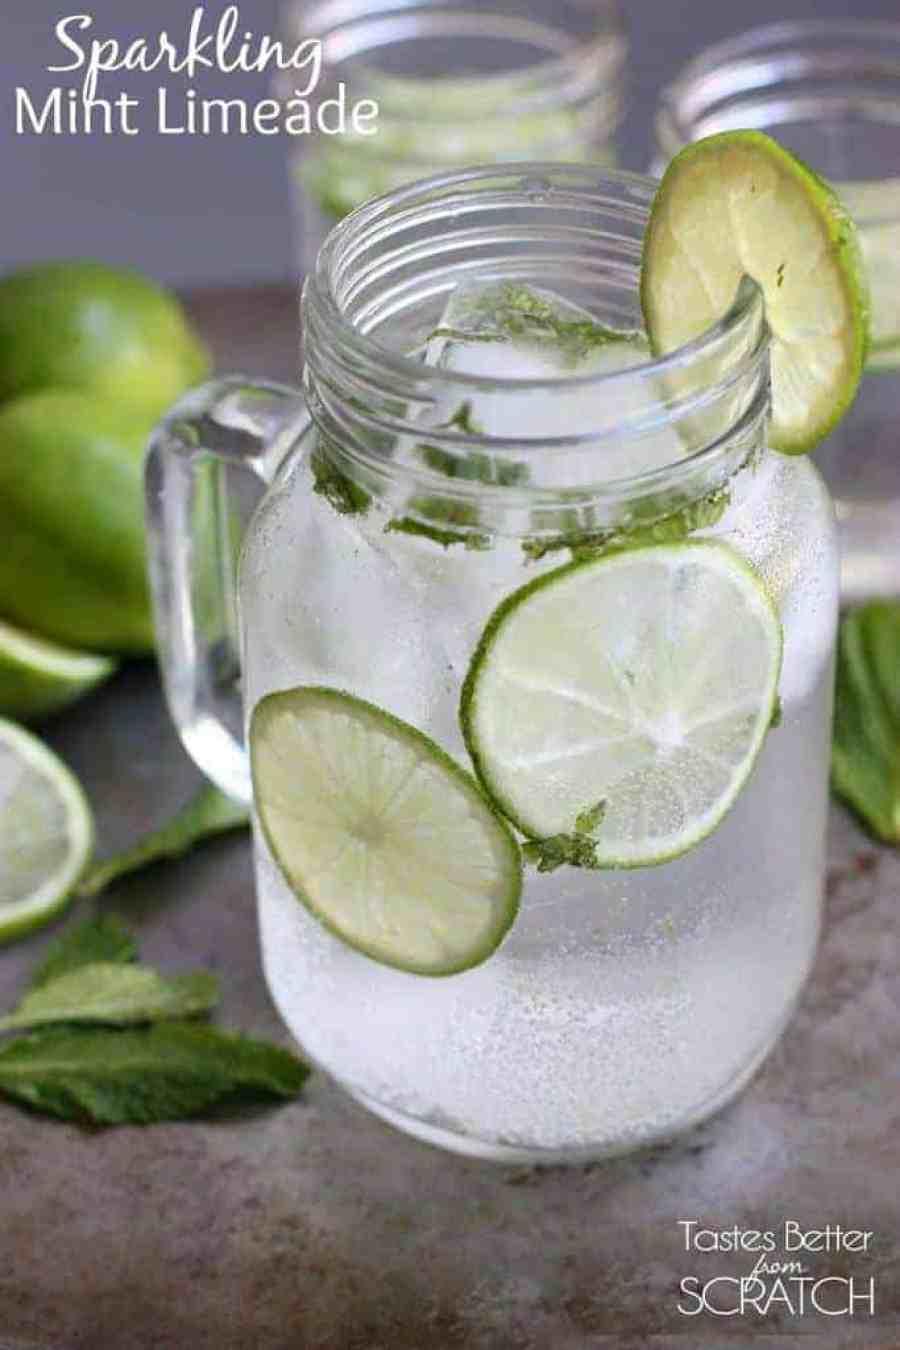 Sparkling Mint Limeade recipe from TastesBetterFromScratch.com